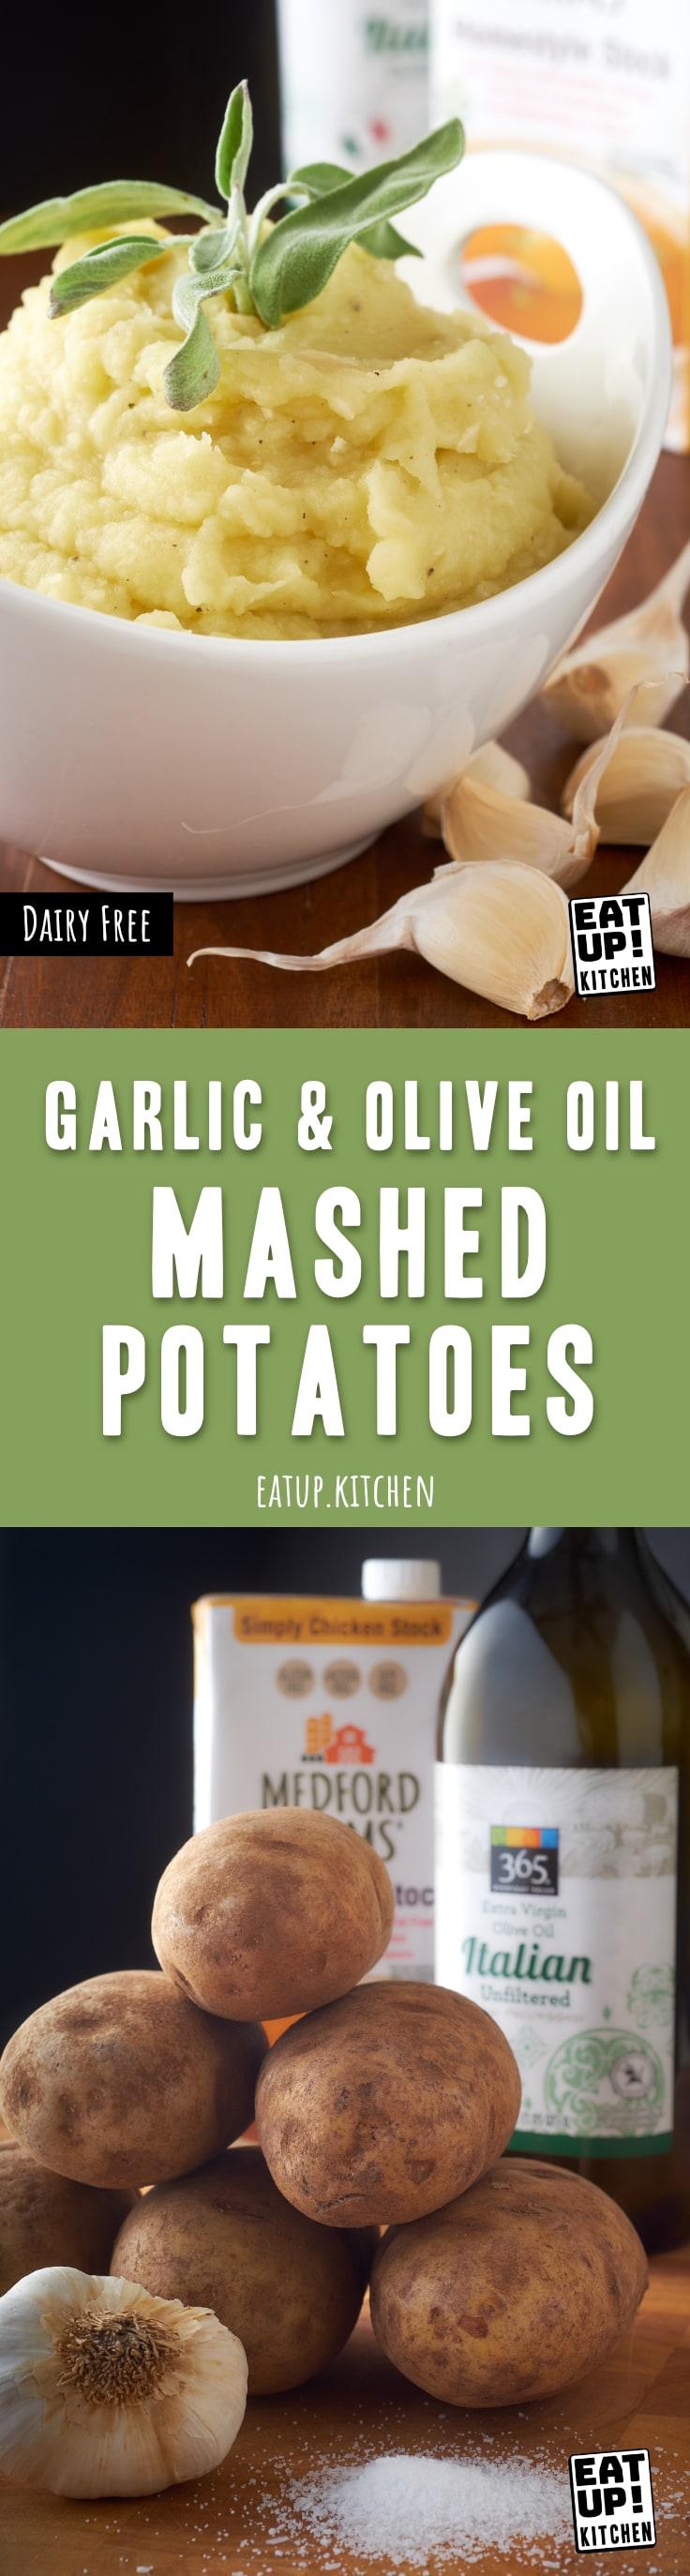 Garlic & Olive Oil Mashed Potatoes